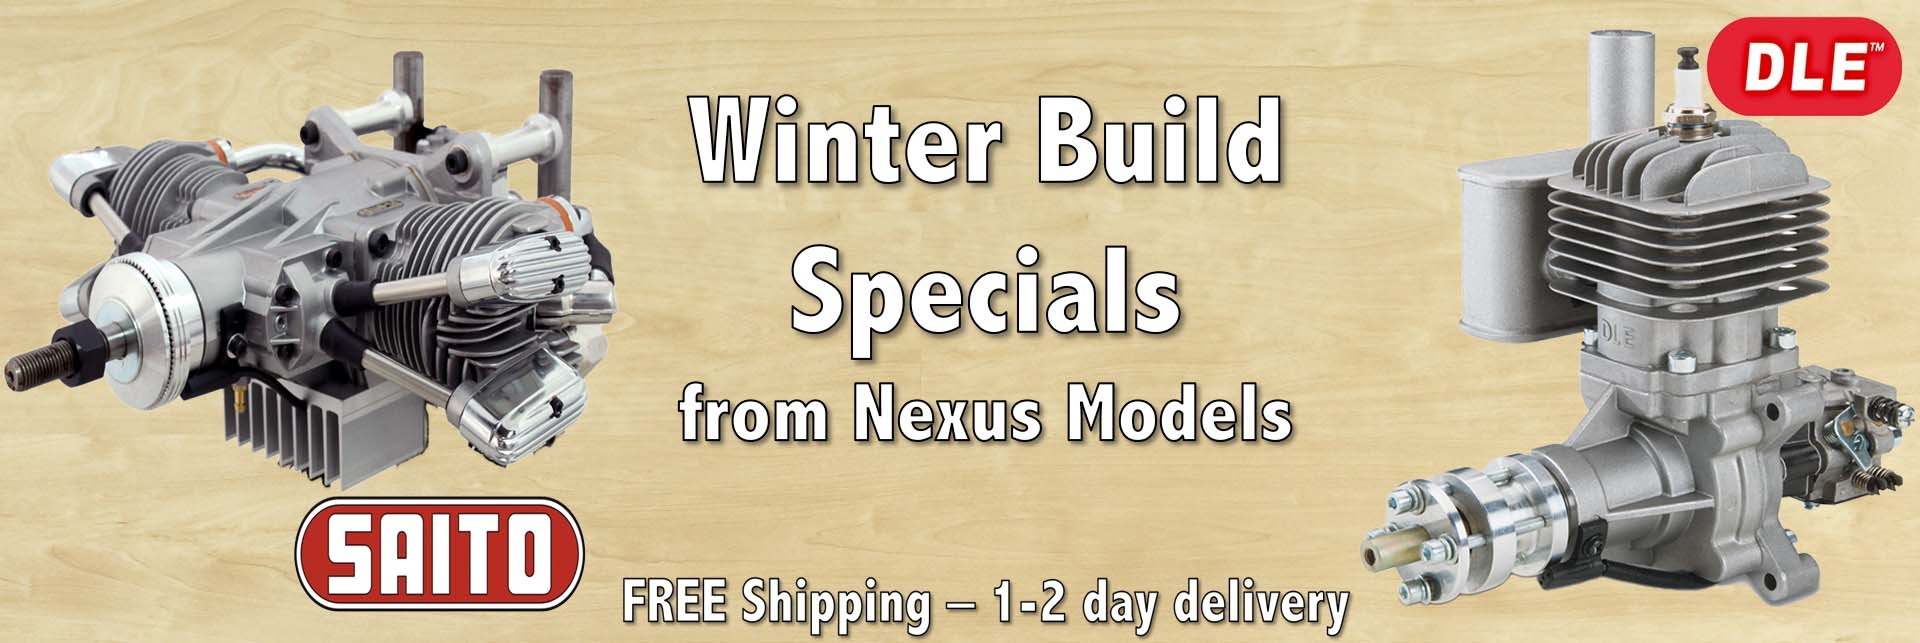 Winter Build Specials